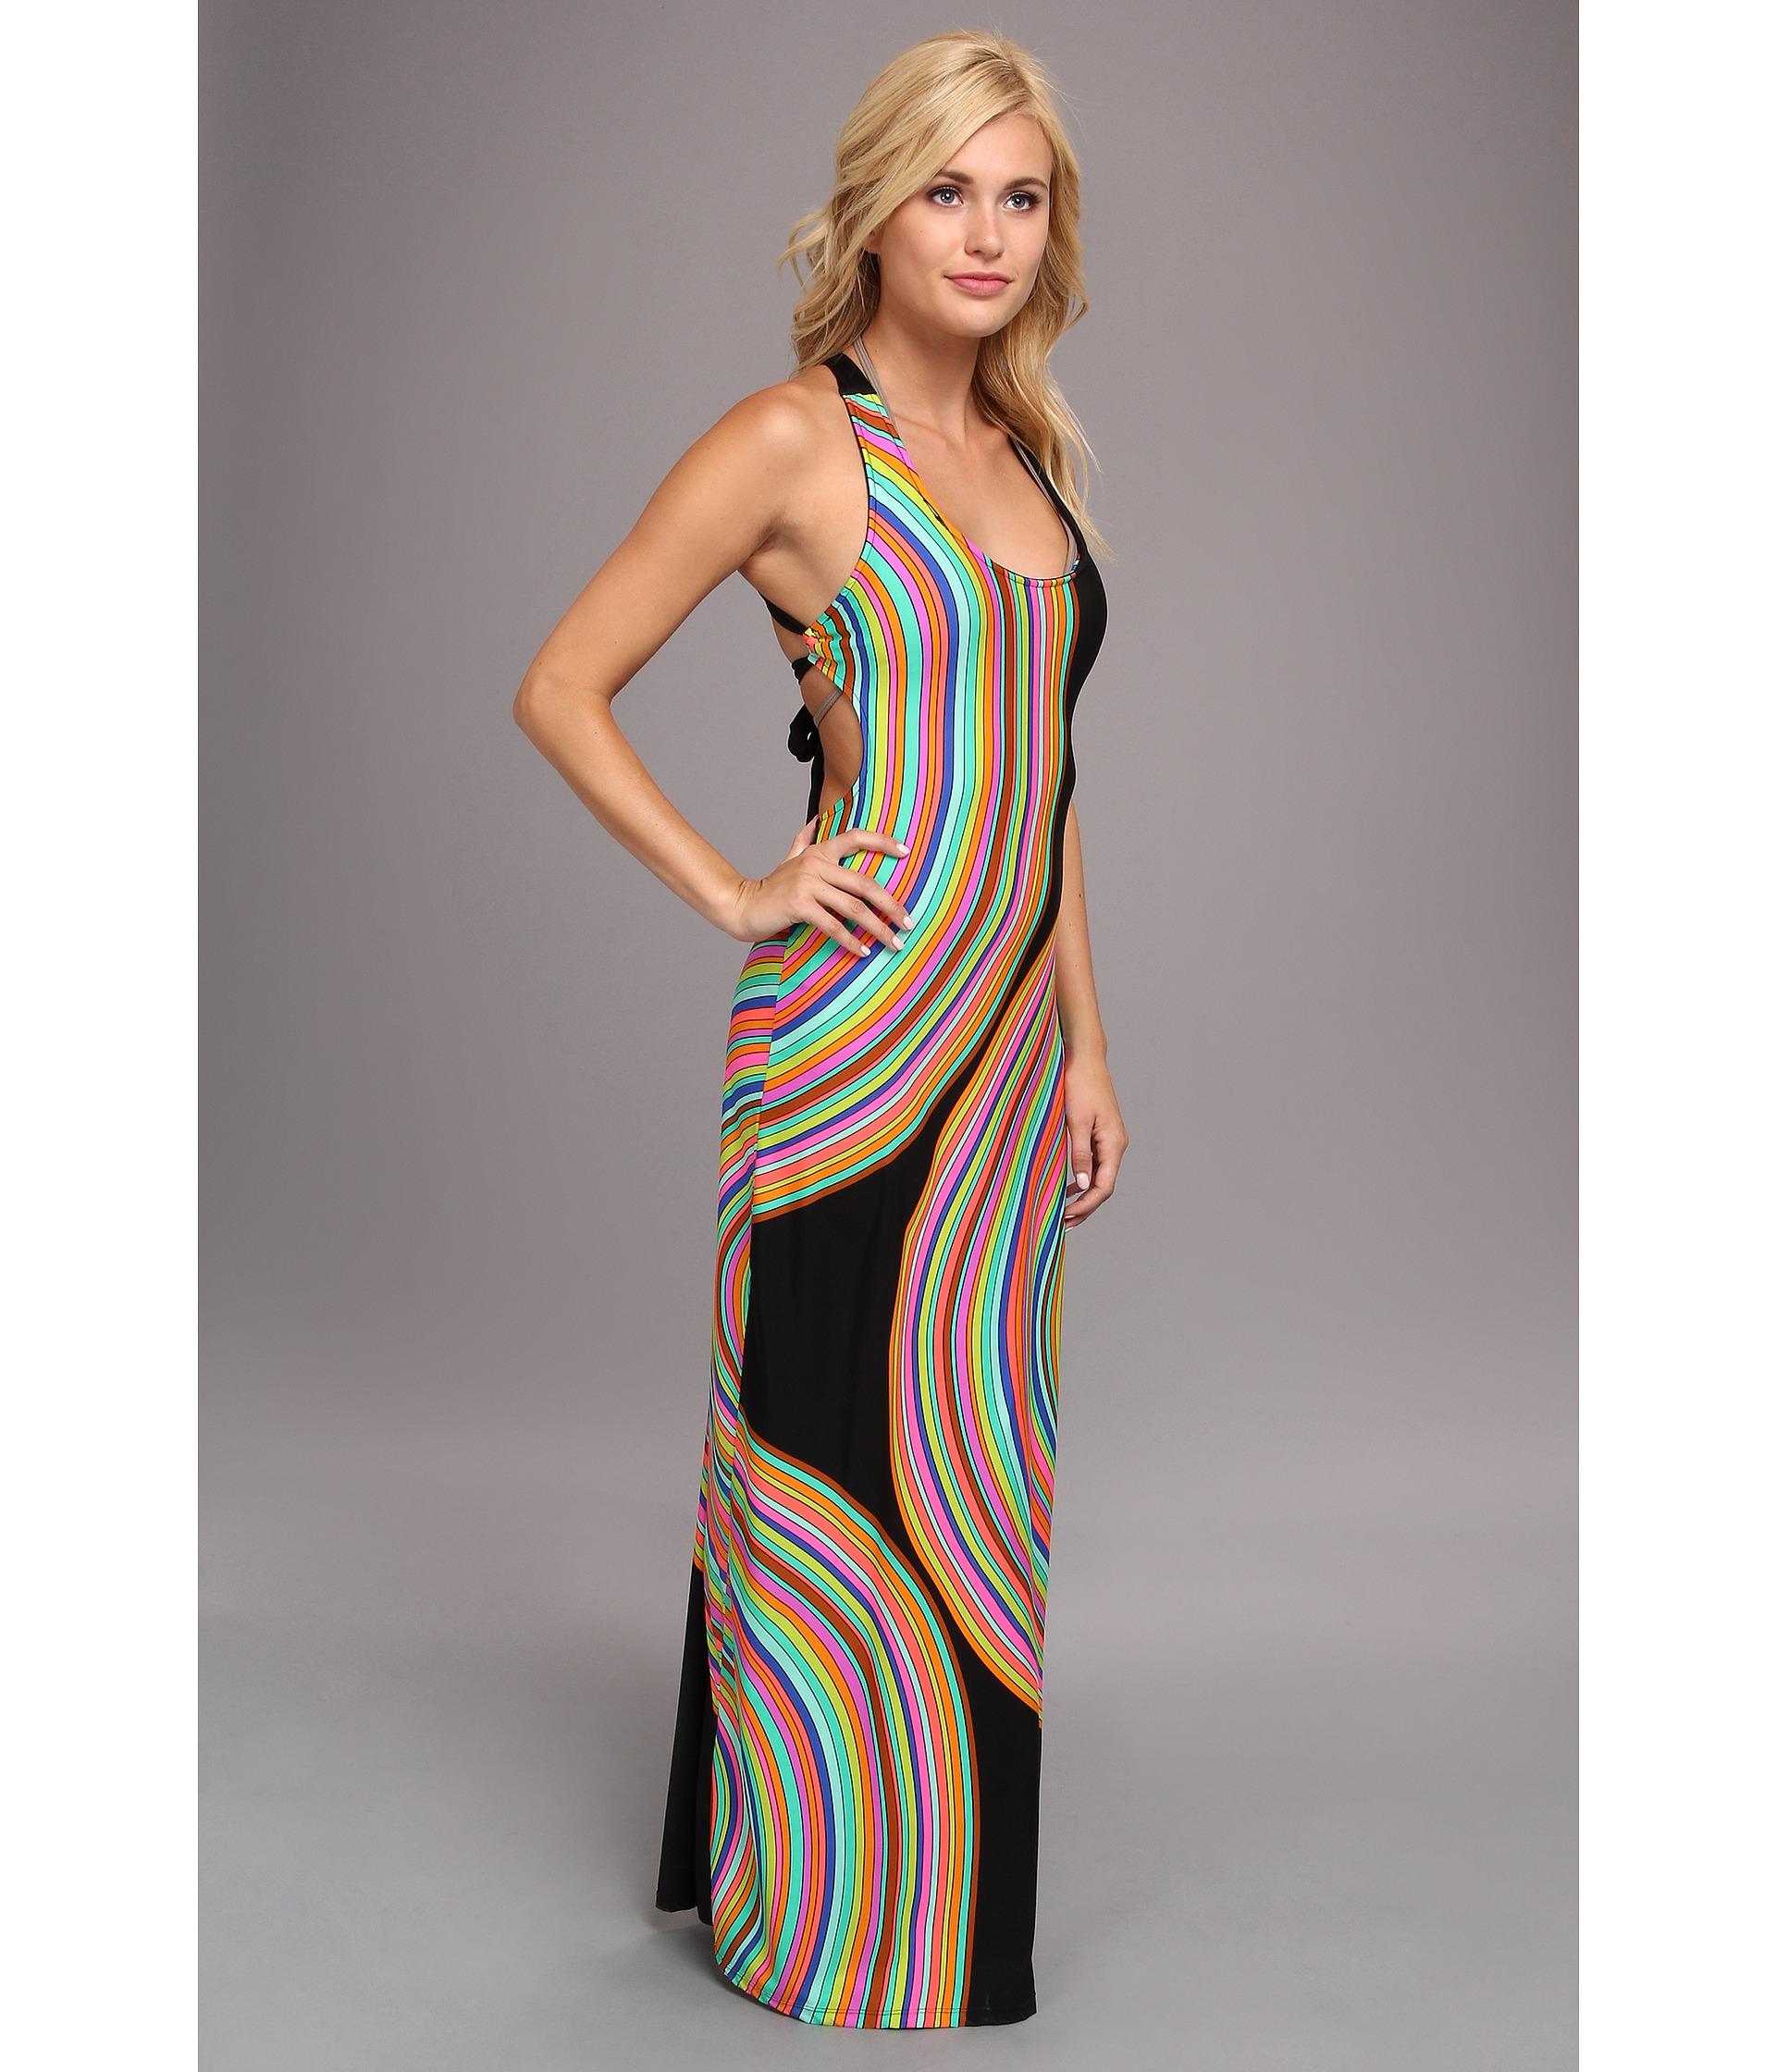 $154 Trina Turk Sombrero Cross Back Long Maxi Jersey Cover Up Dress